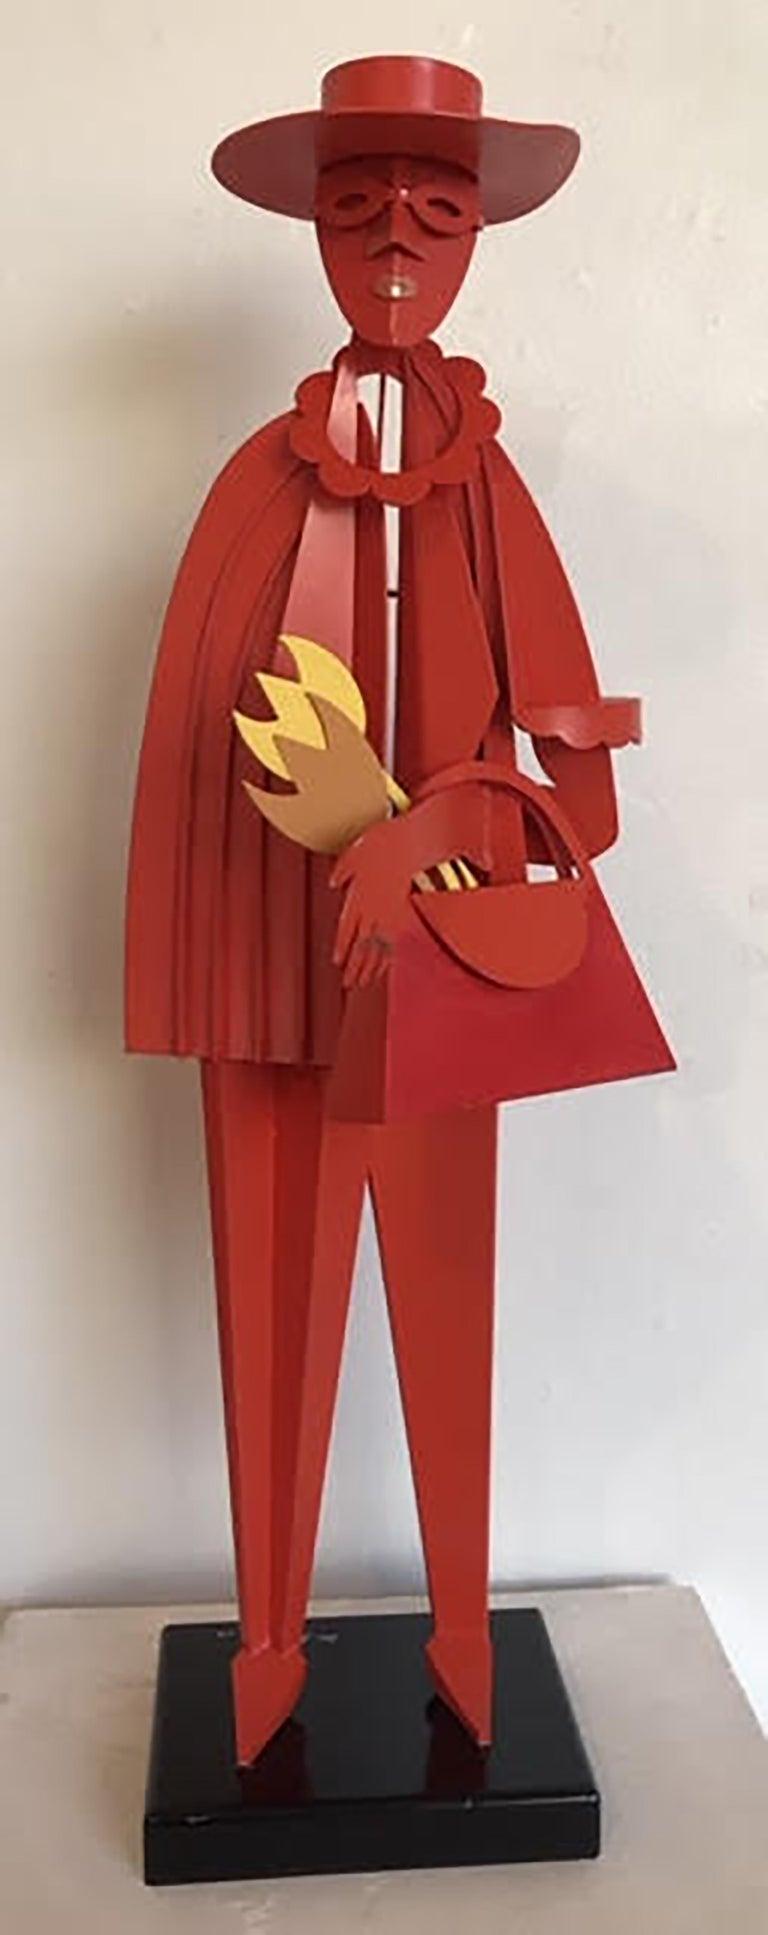 Untitled - Sculpture by Jaechun Ko